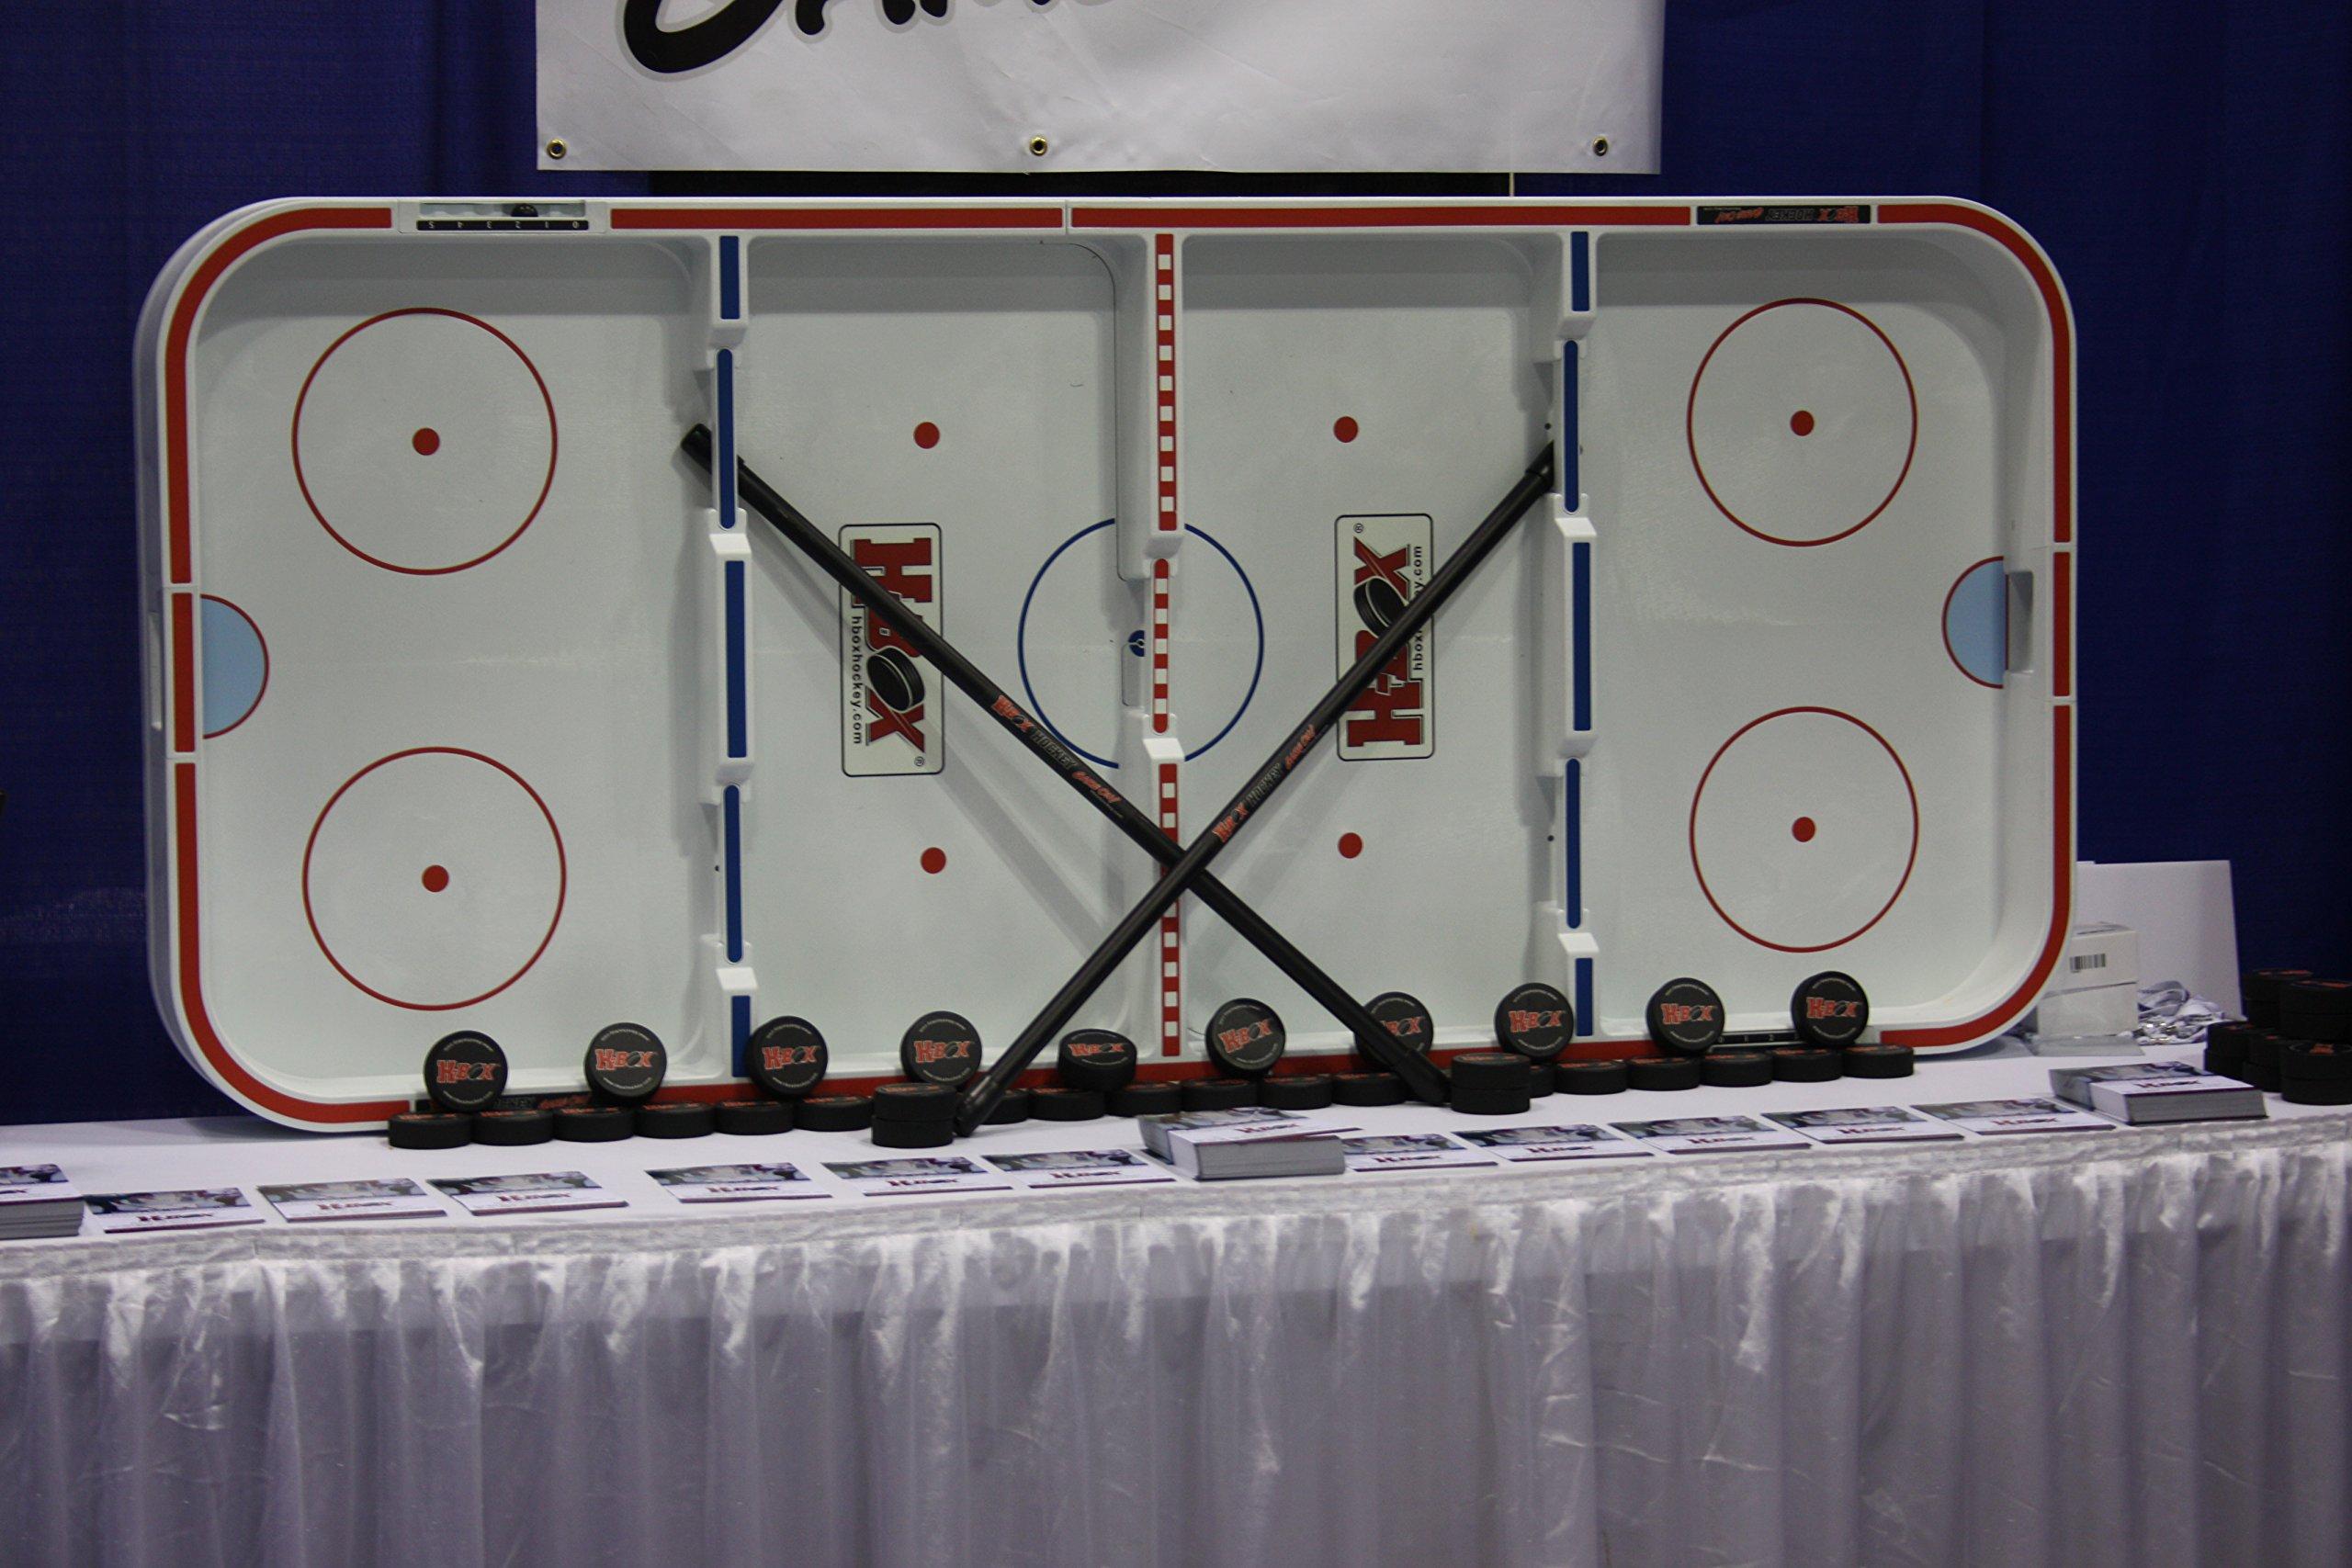 Box Hockey Game with Fiberglass Sticks & Real Puck (Universal, 42)